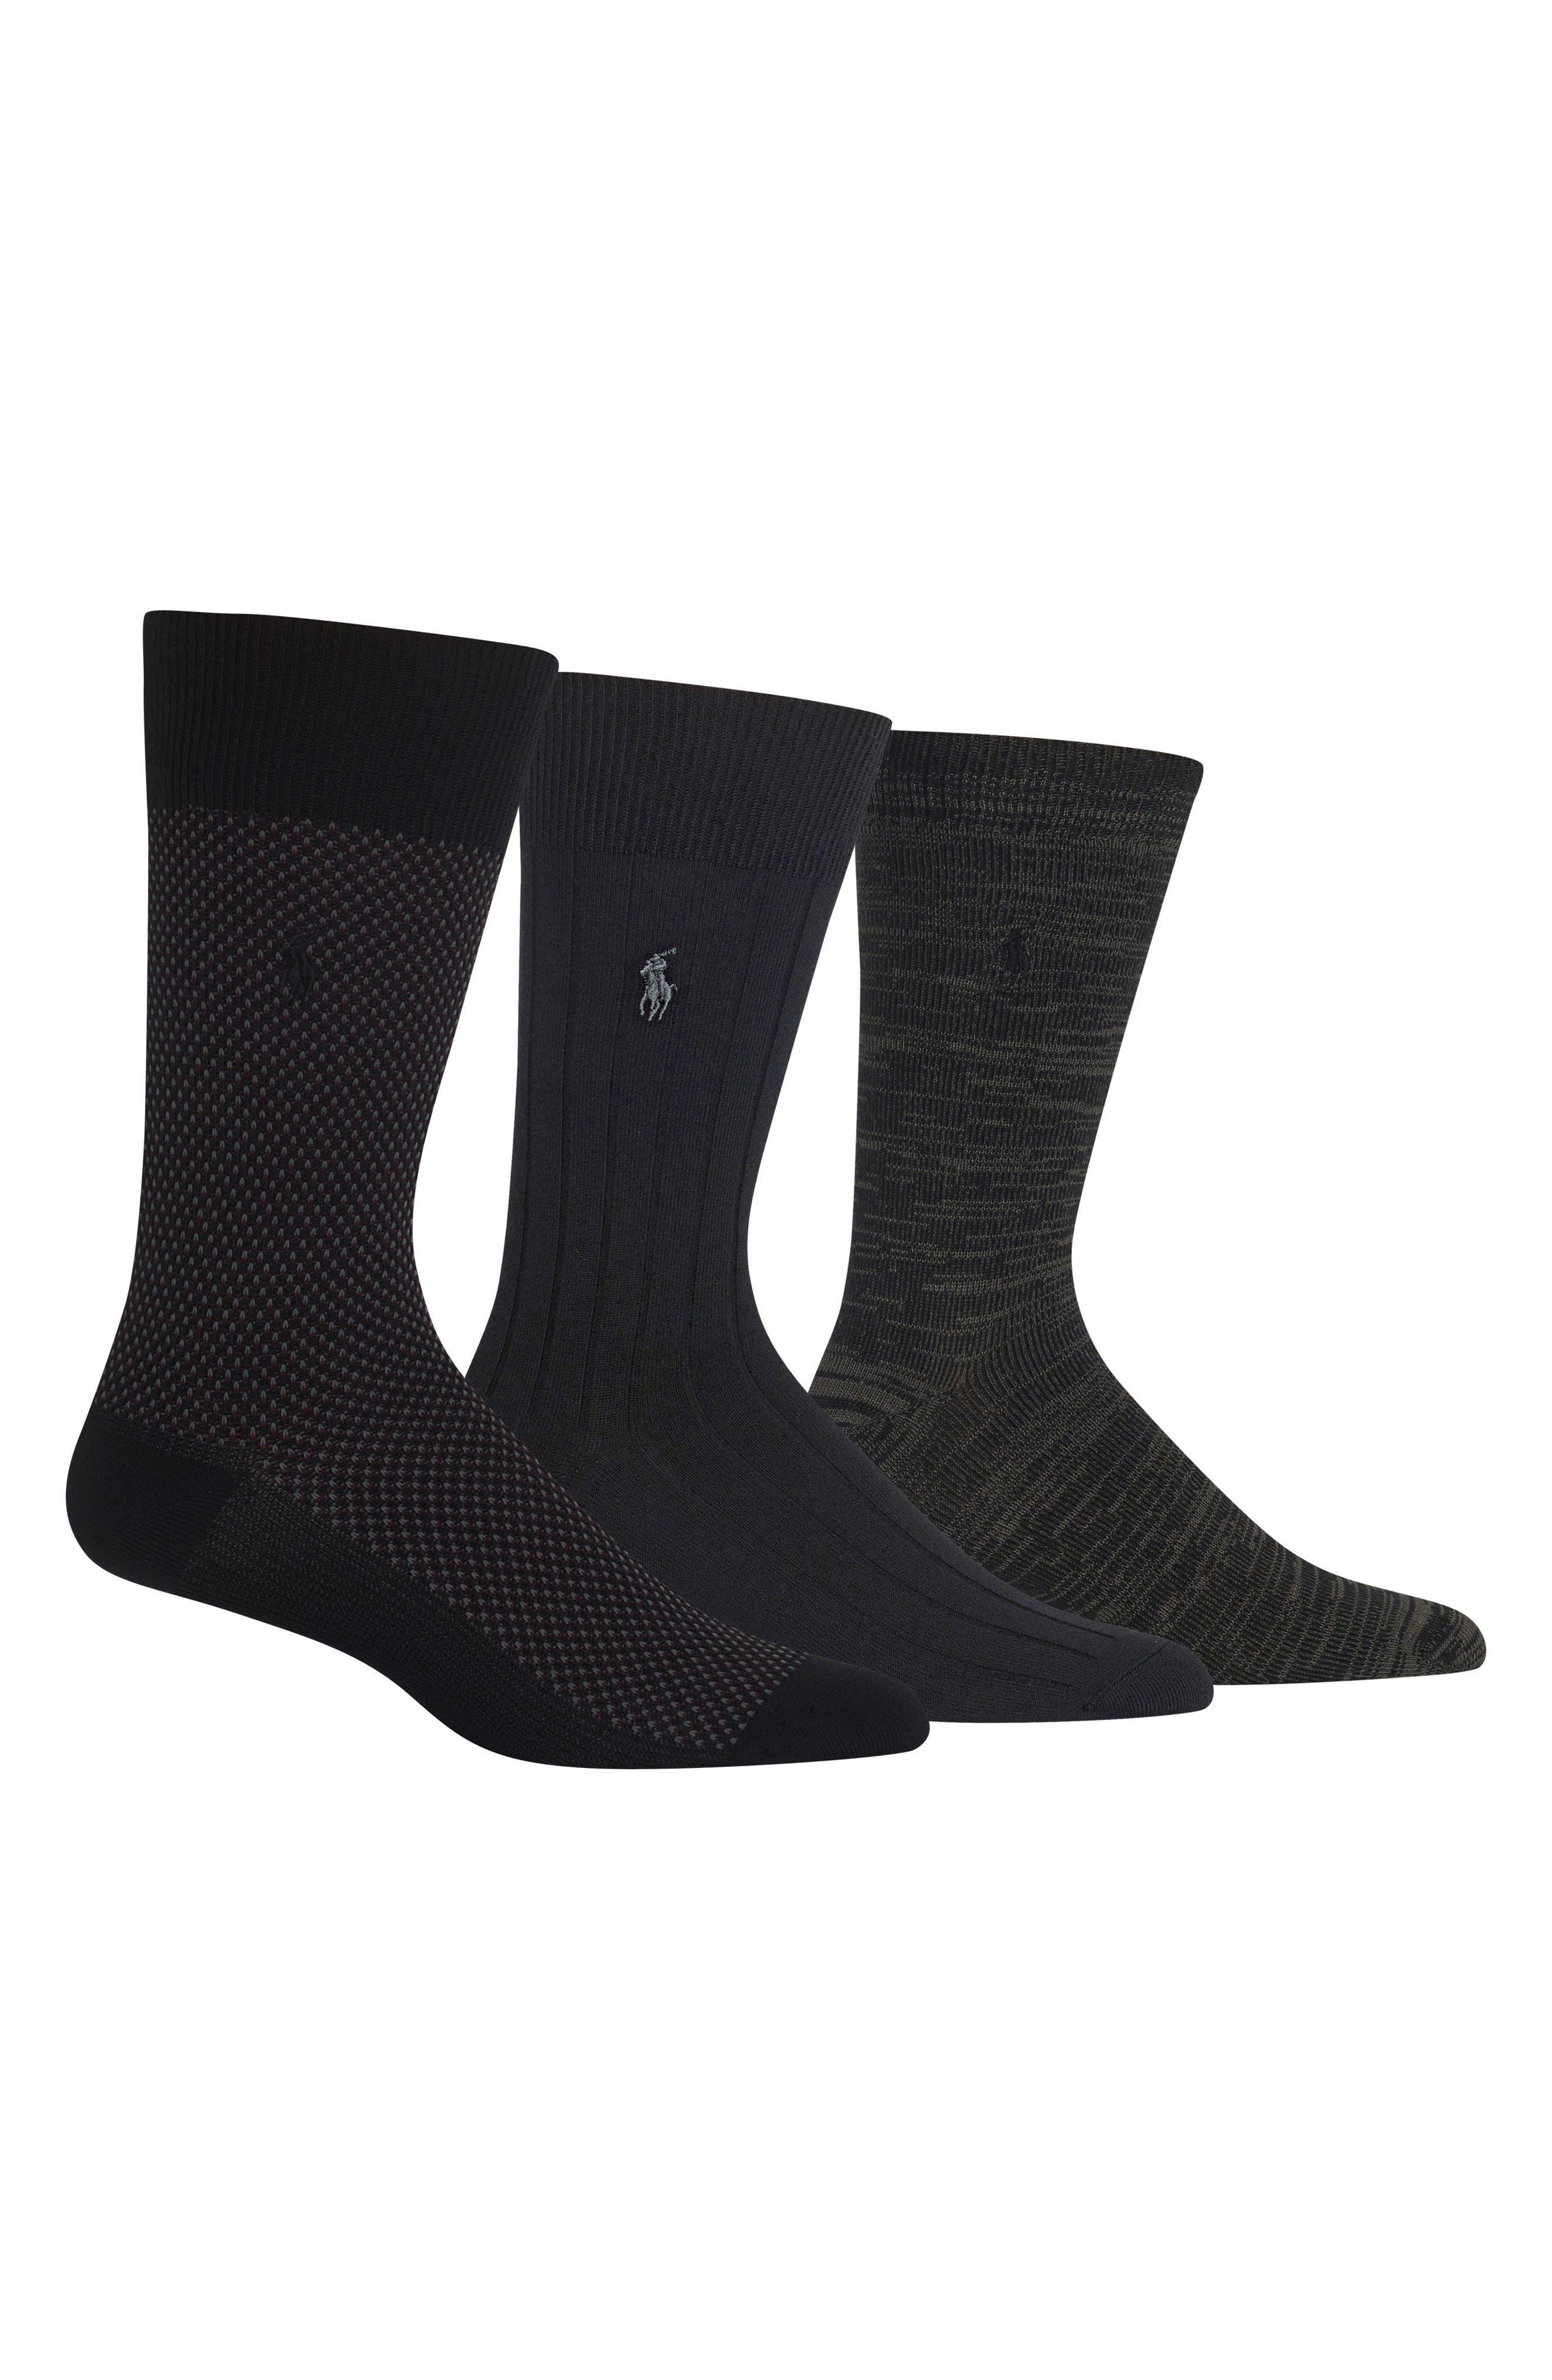 POLO RALPH LAUREN Assorted 3-Pack Bird's Eye Socks, Main, color, BLACK